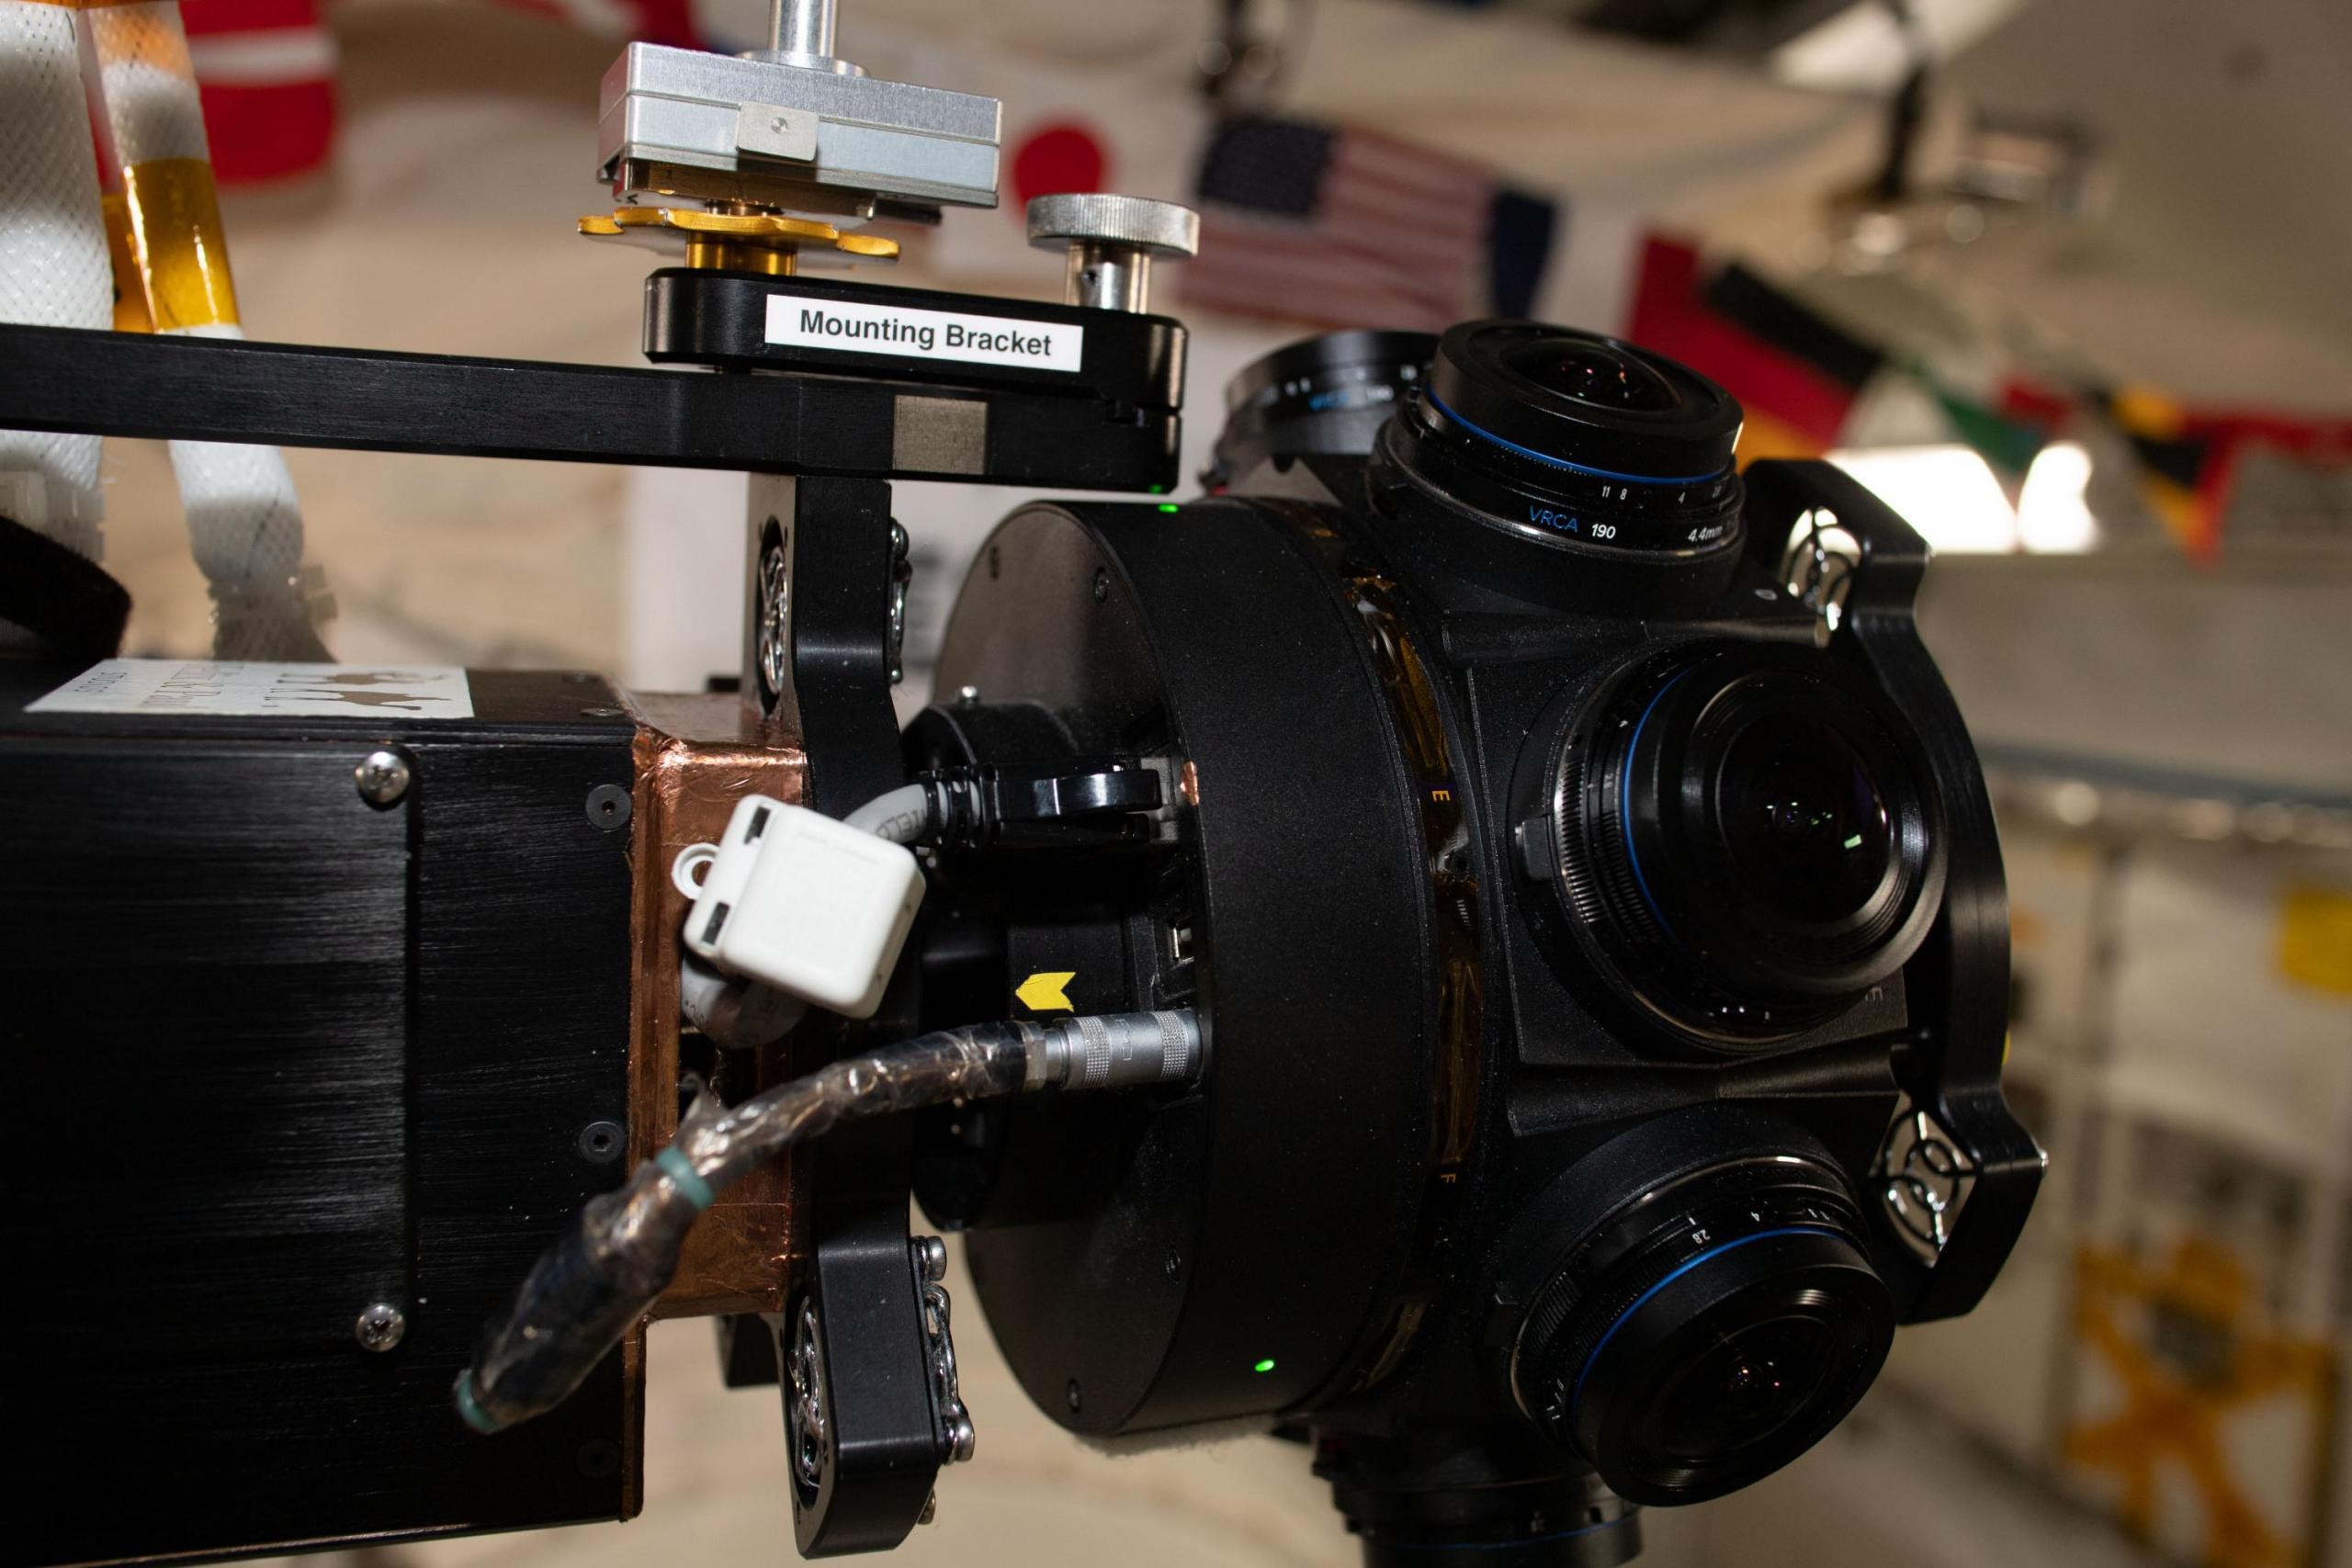 Hardware de cámaras de 360 grados de ISS Experience